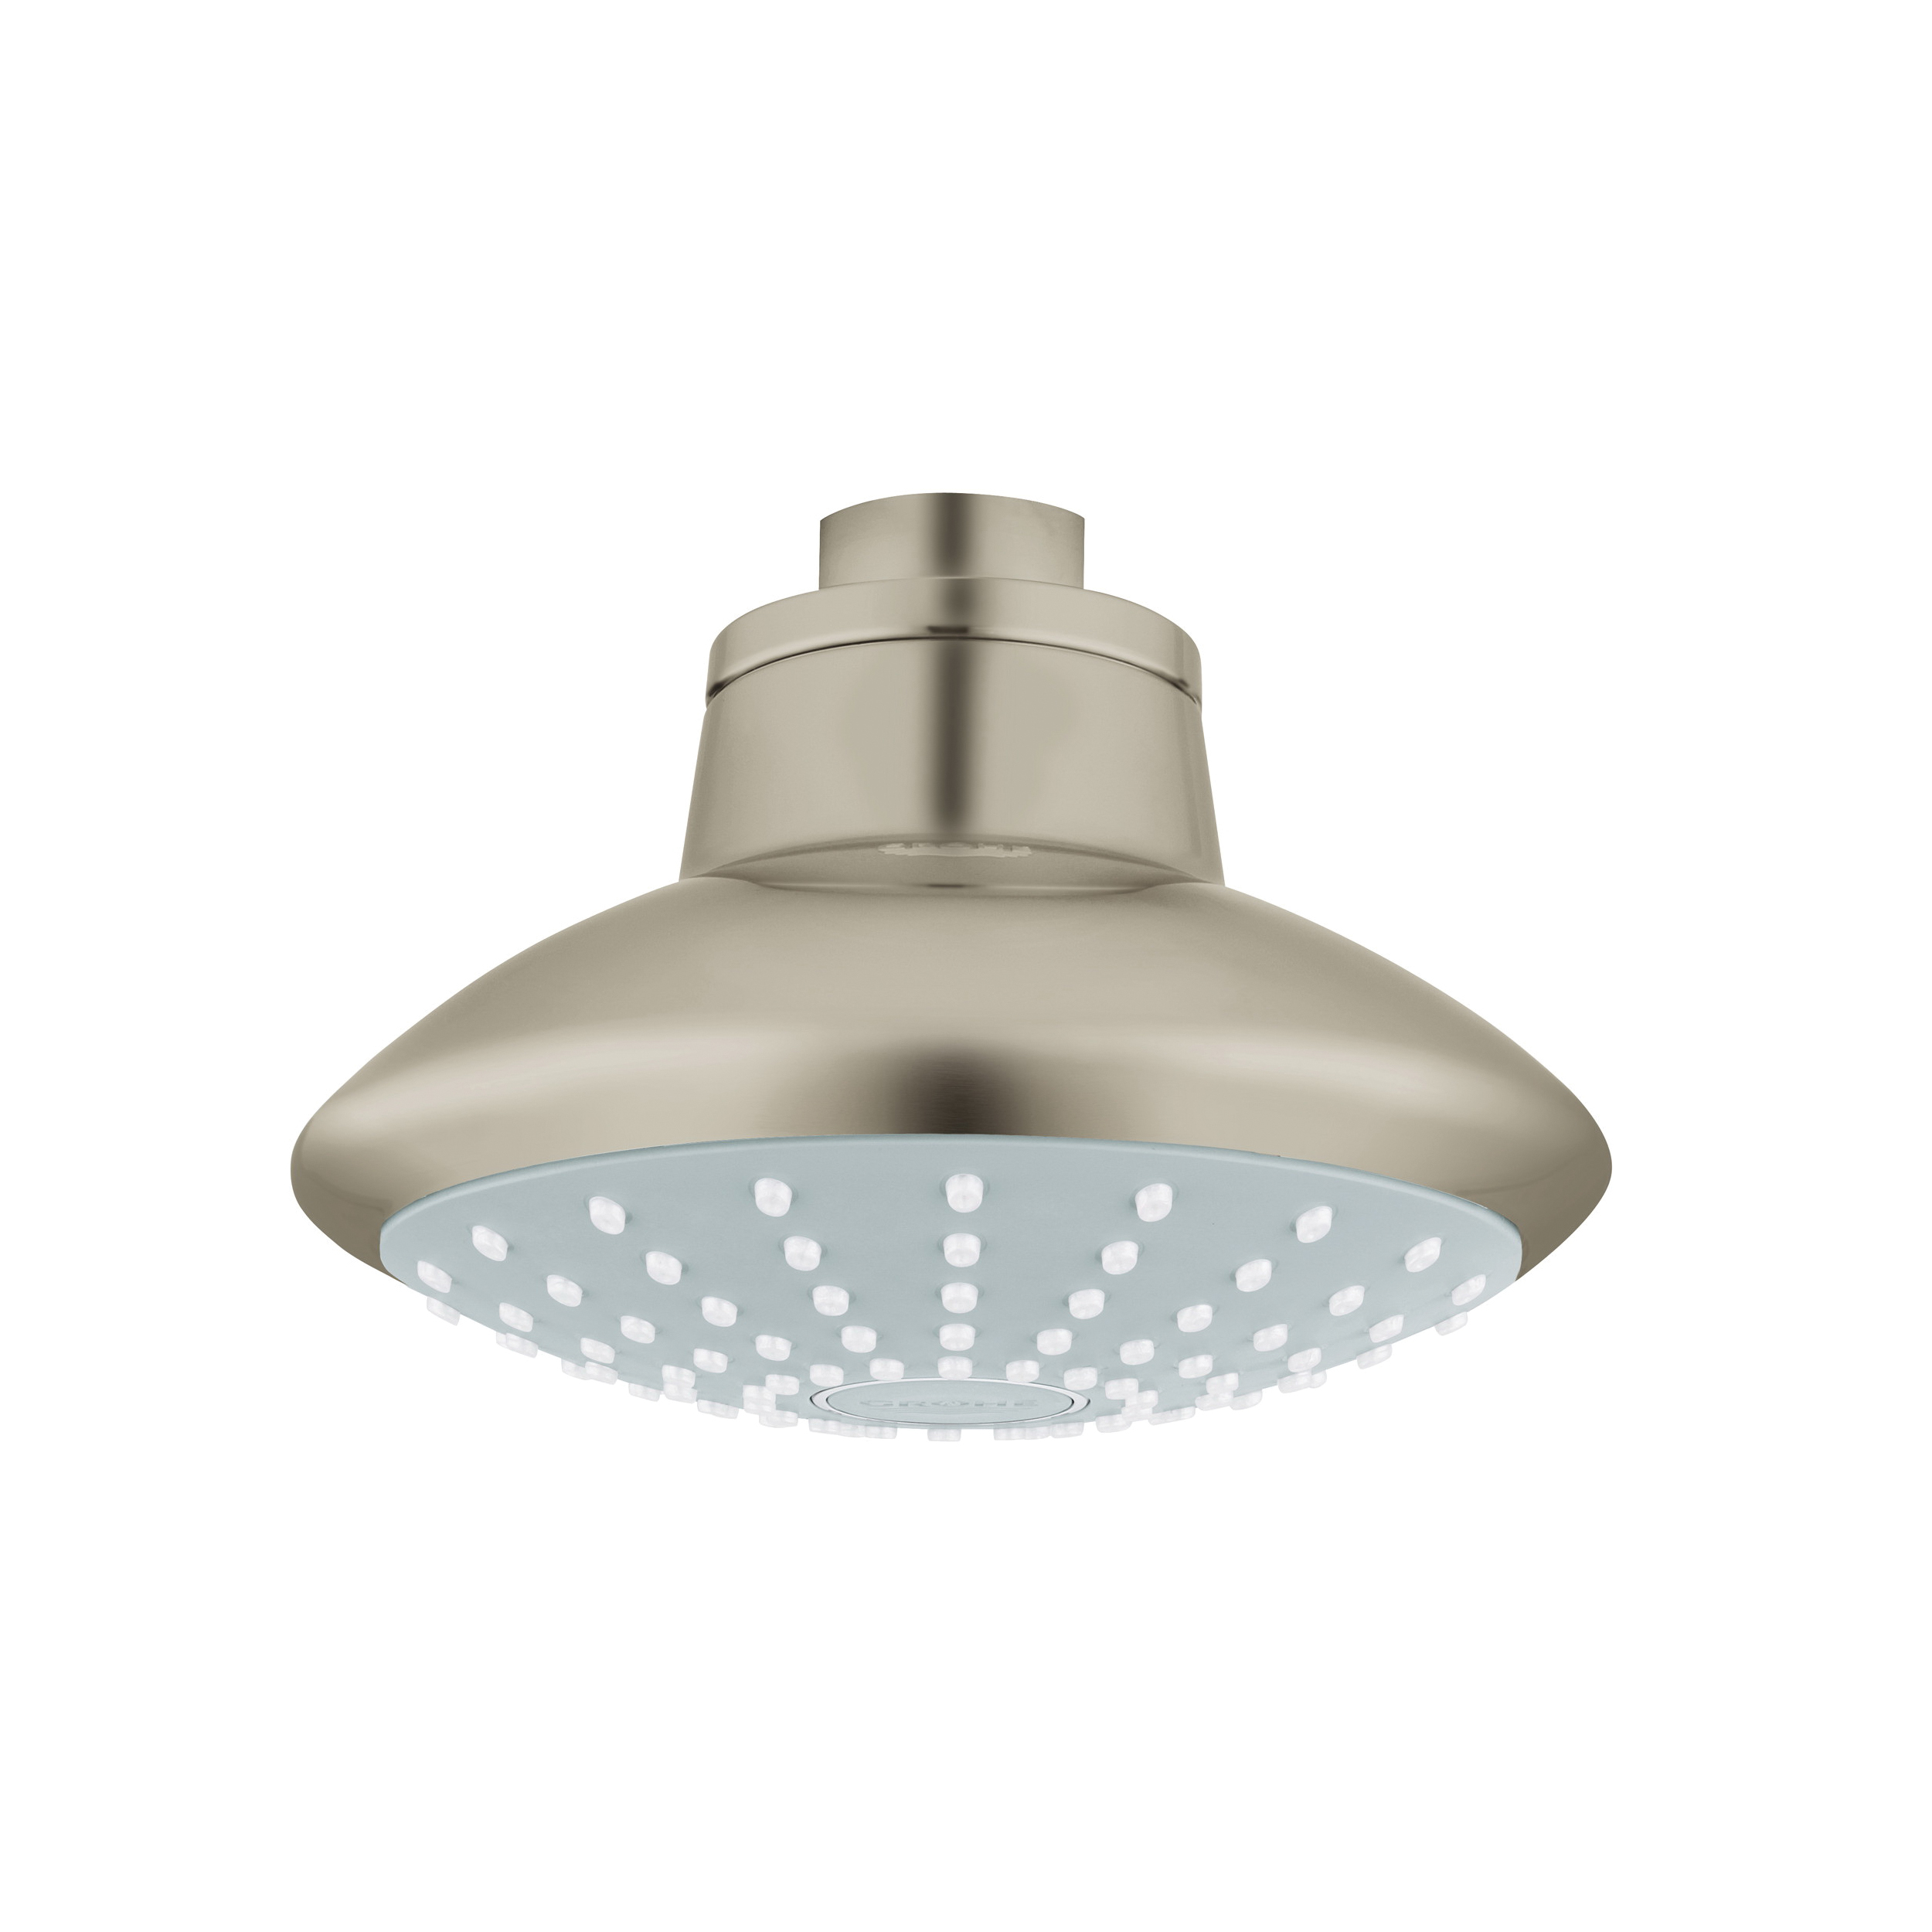 GROHE 27810EN1 Euphoria 110 Mono Shower Head, 2 gpm, 1 Spray, Wall Mount, 4.62 in Head, Import